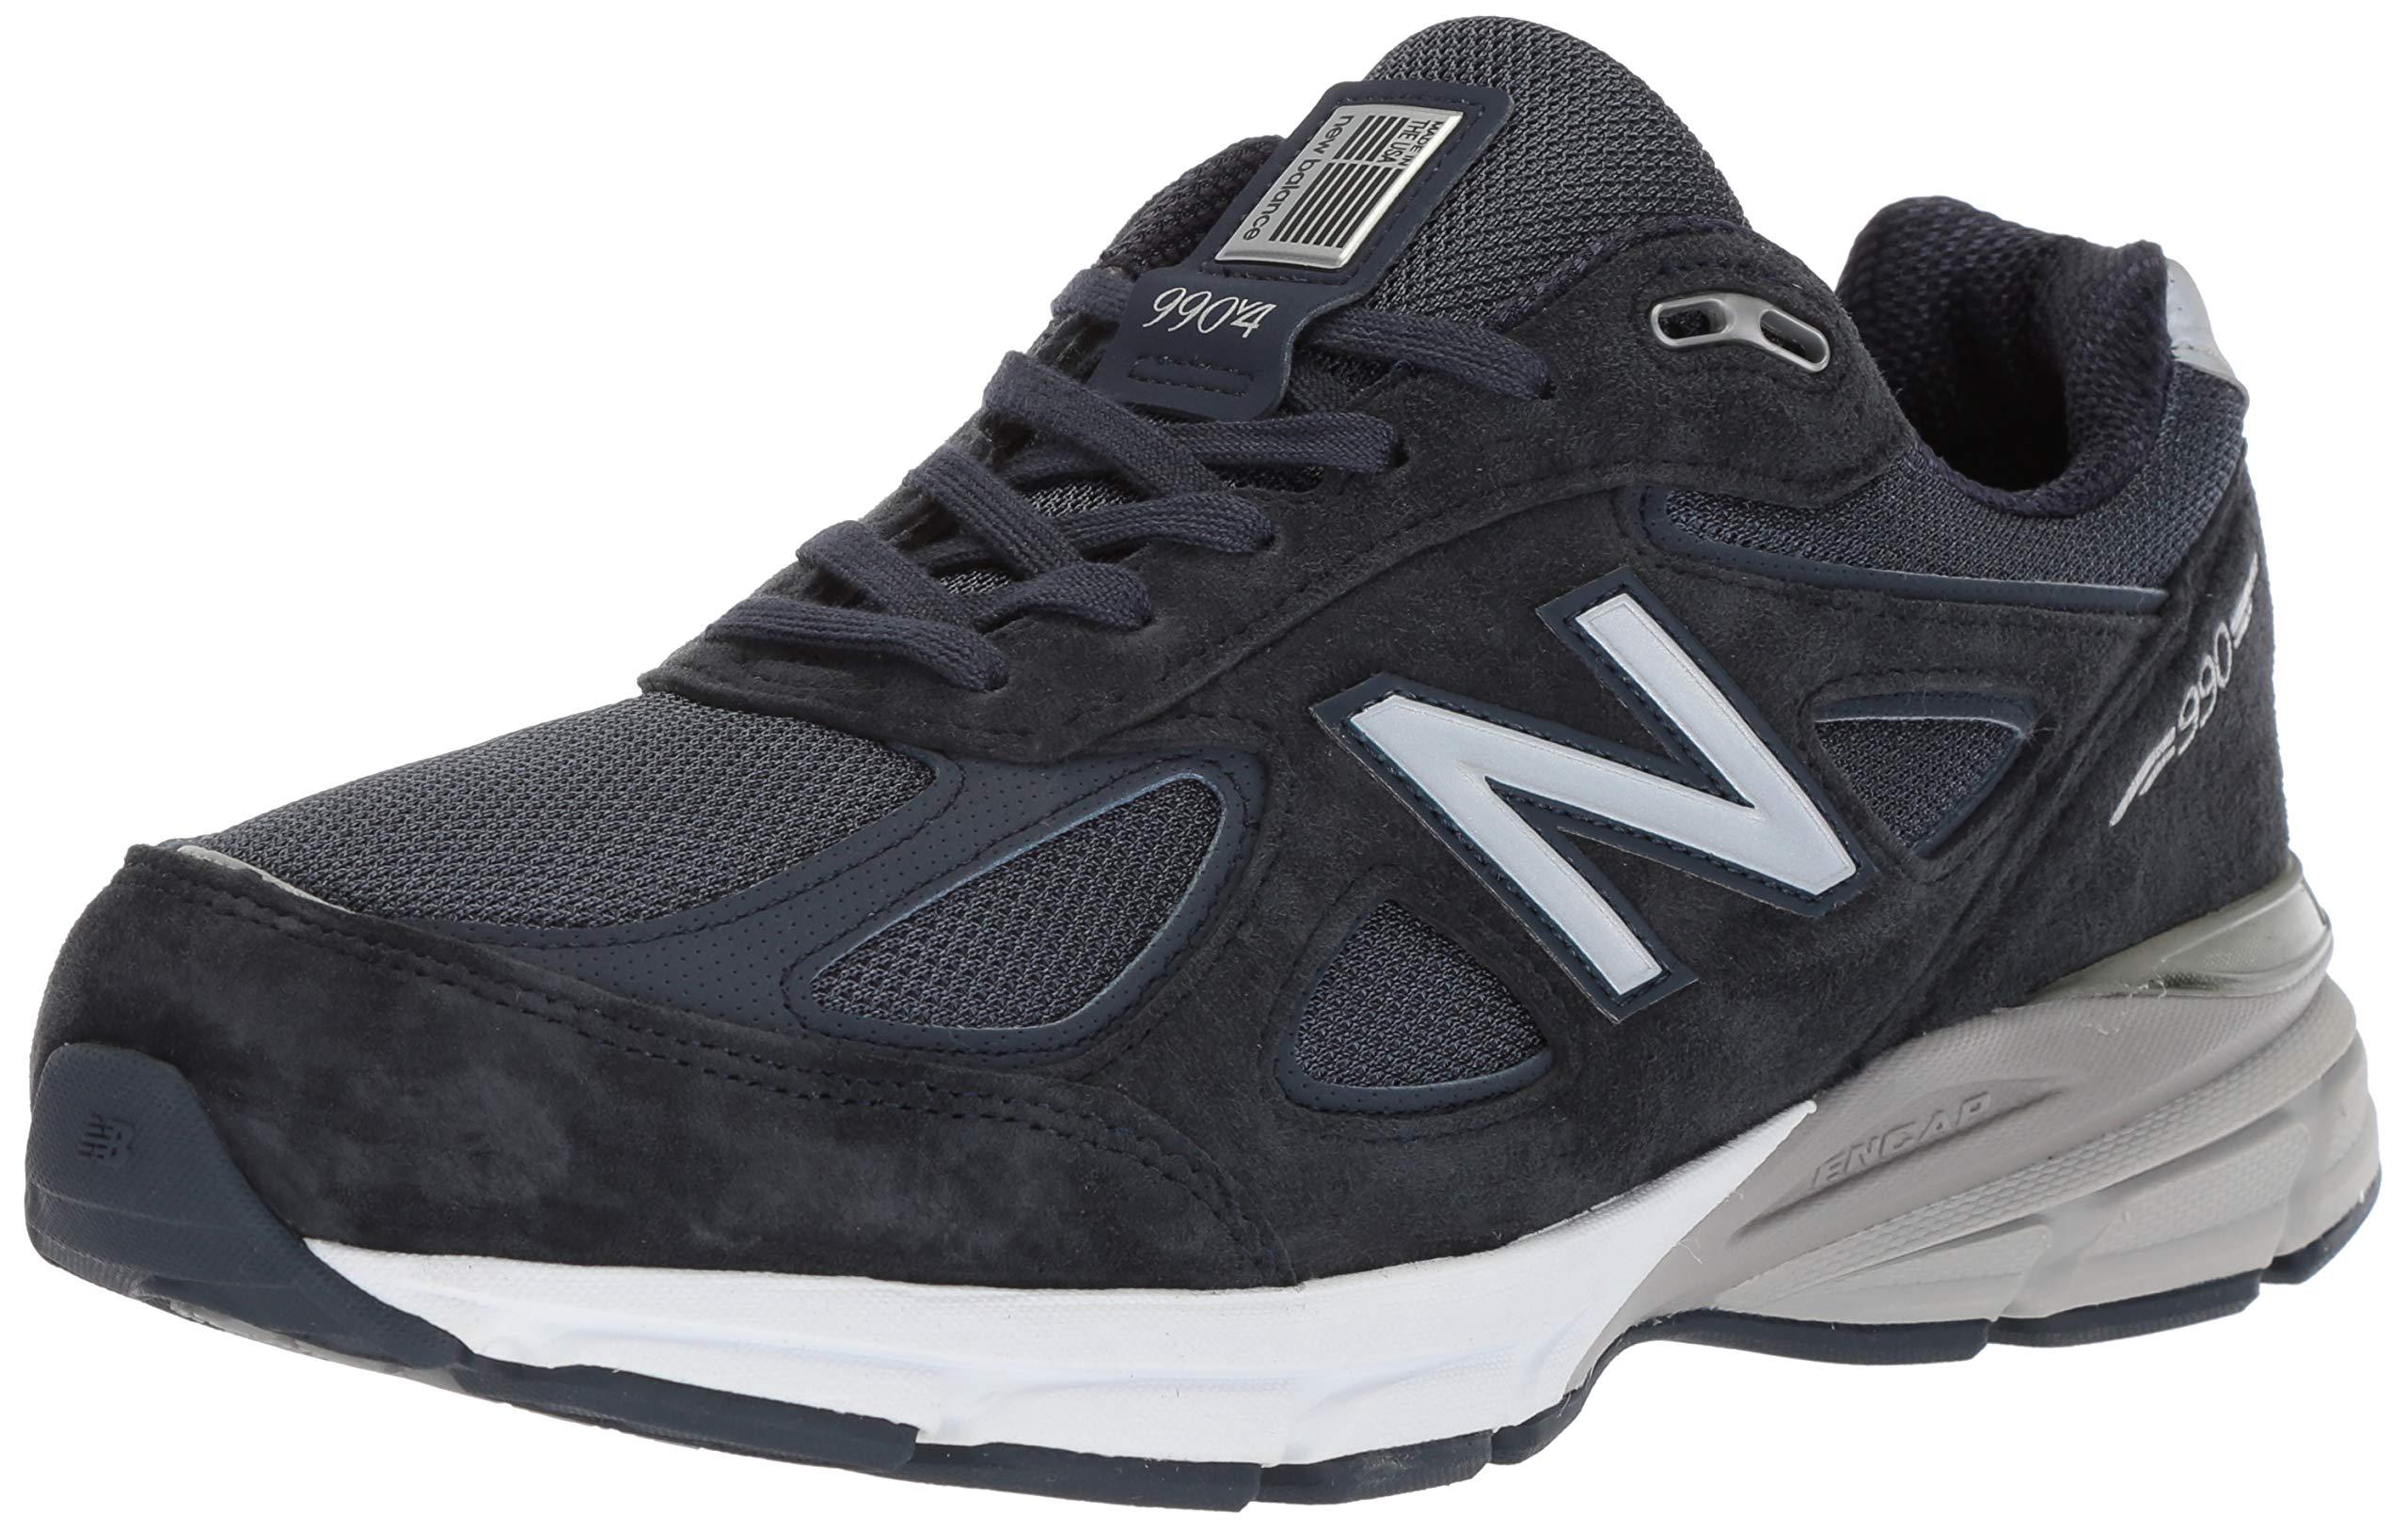 New Balance Men's 990v4, Dark Blue/Black 10 6E US